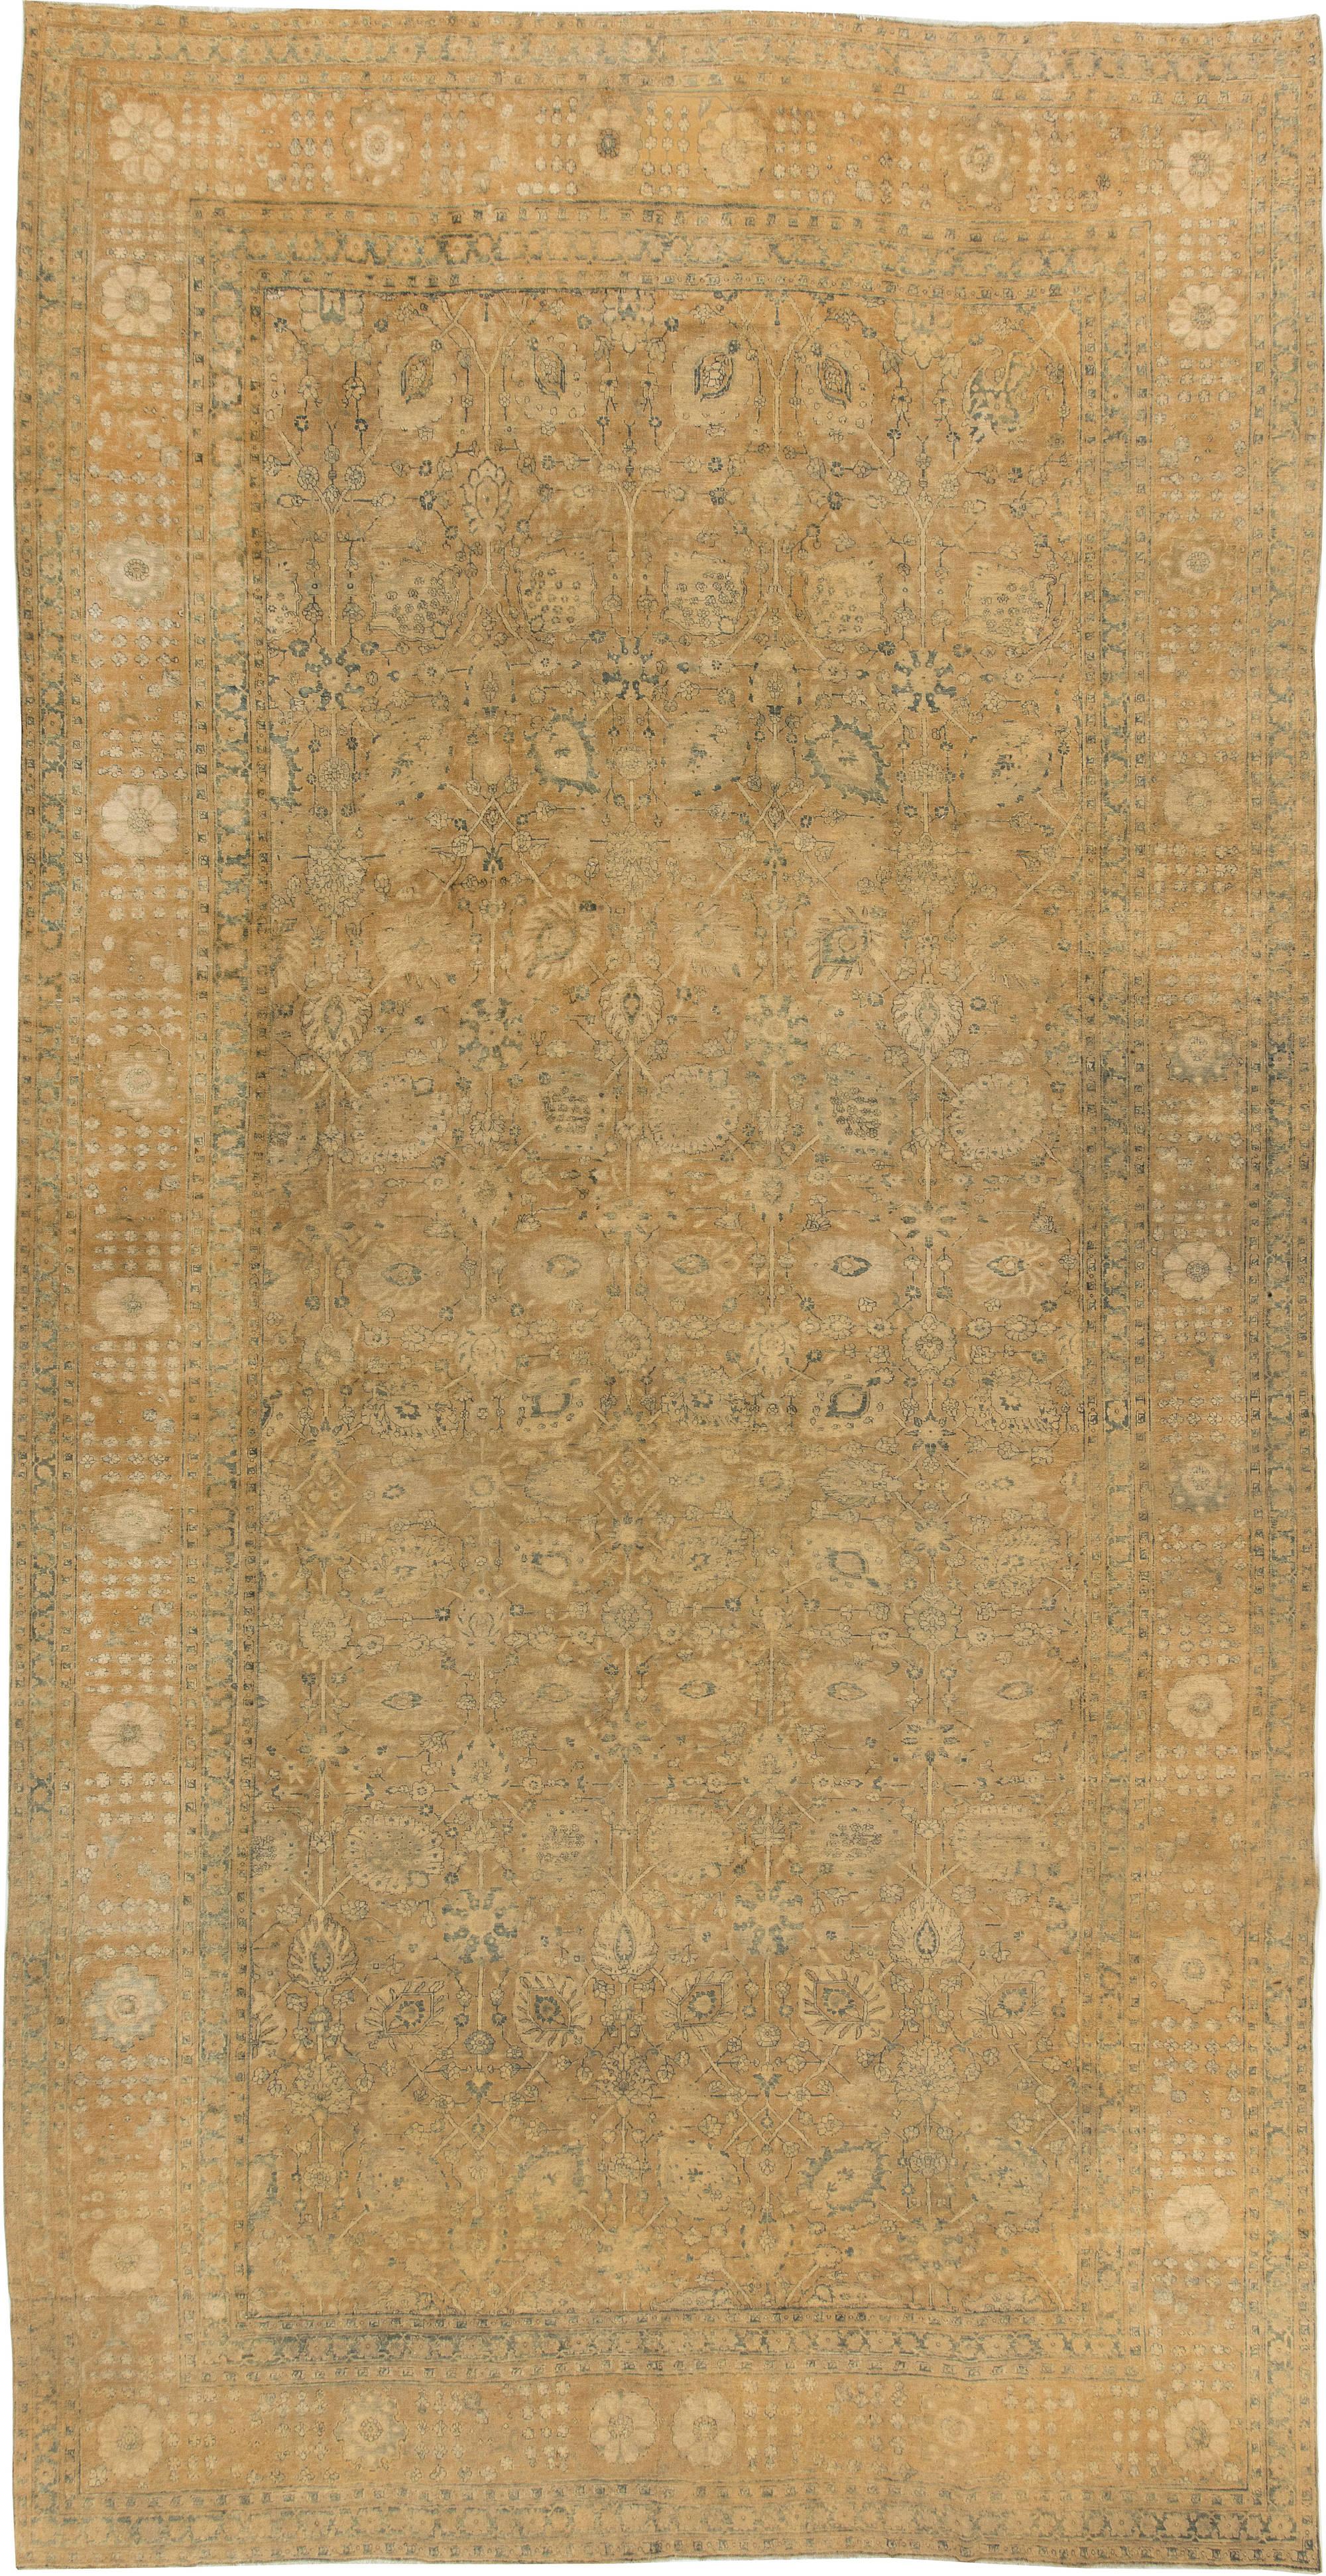 Antique Persian Tabriz Rug (size adjusted) BB2896